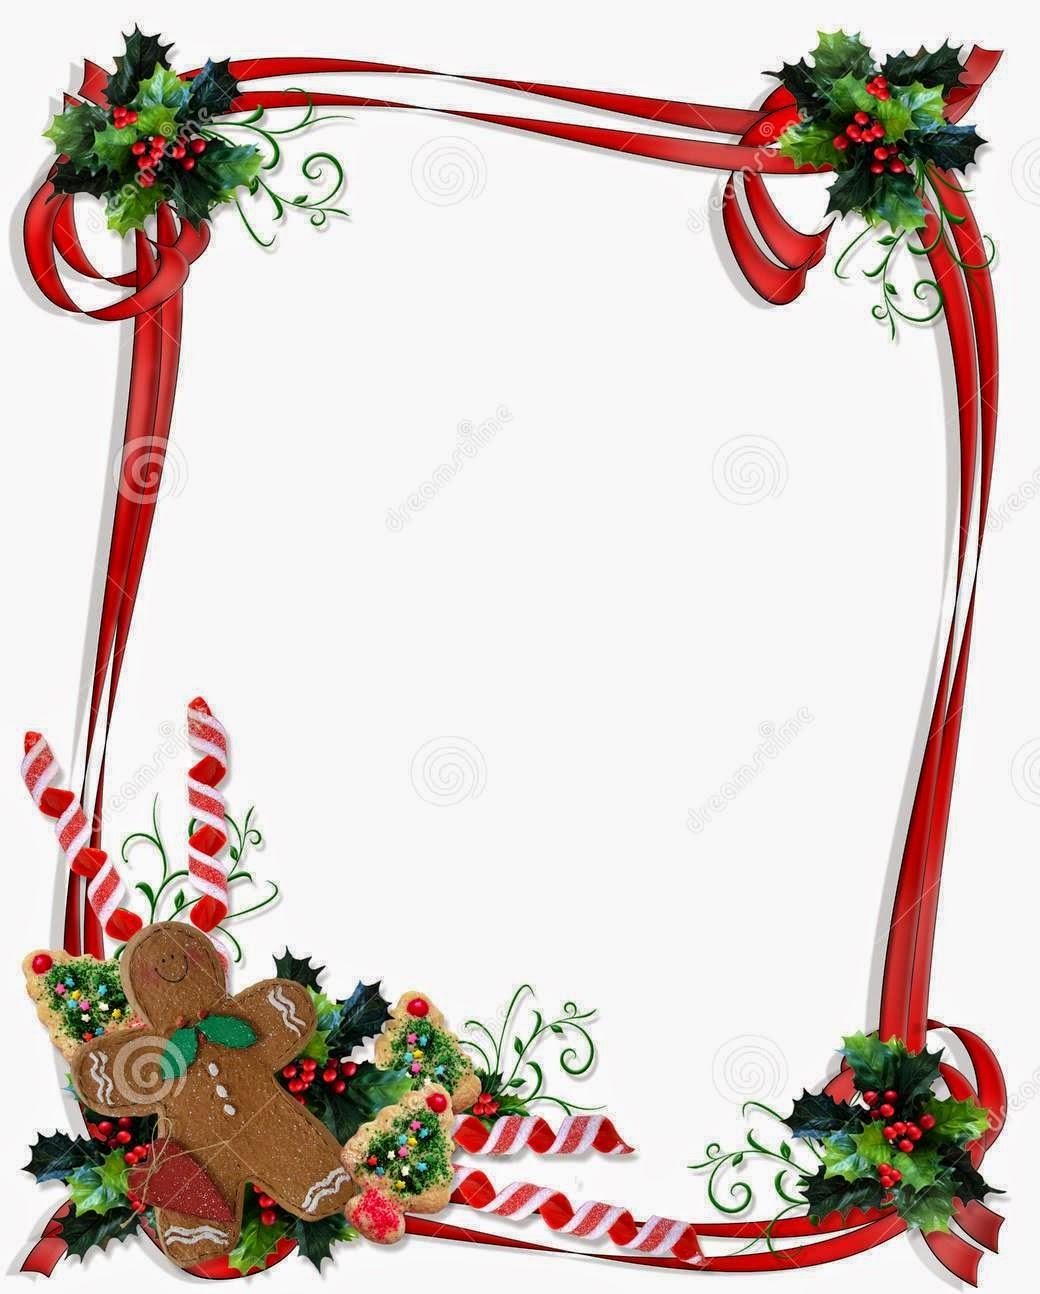 free christmas clipart borders frames - photo #42